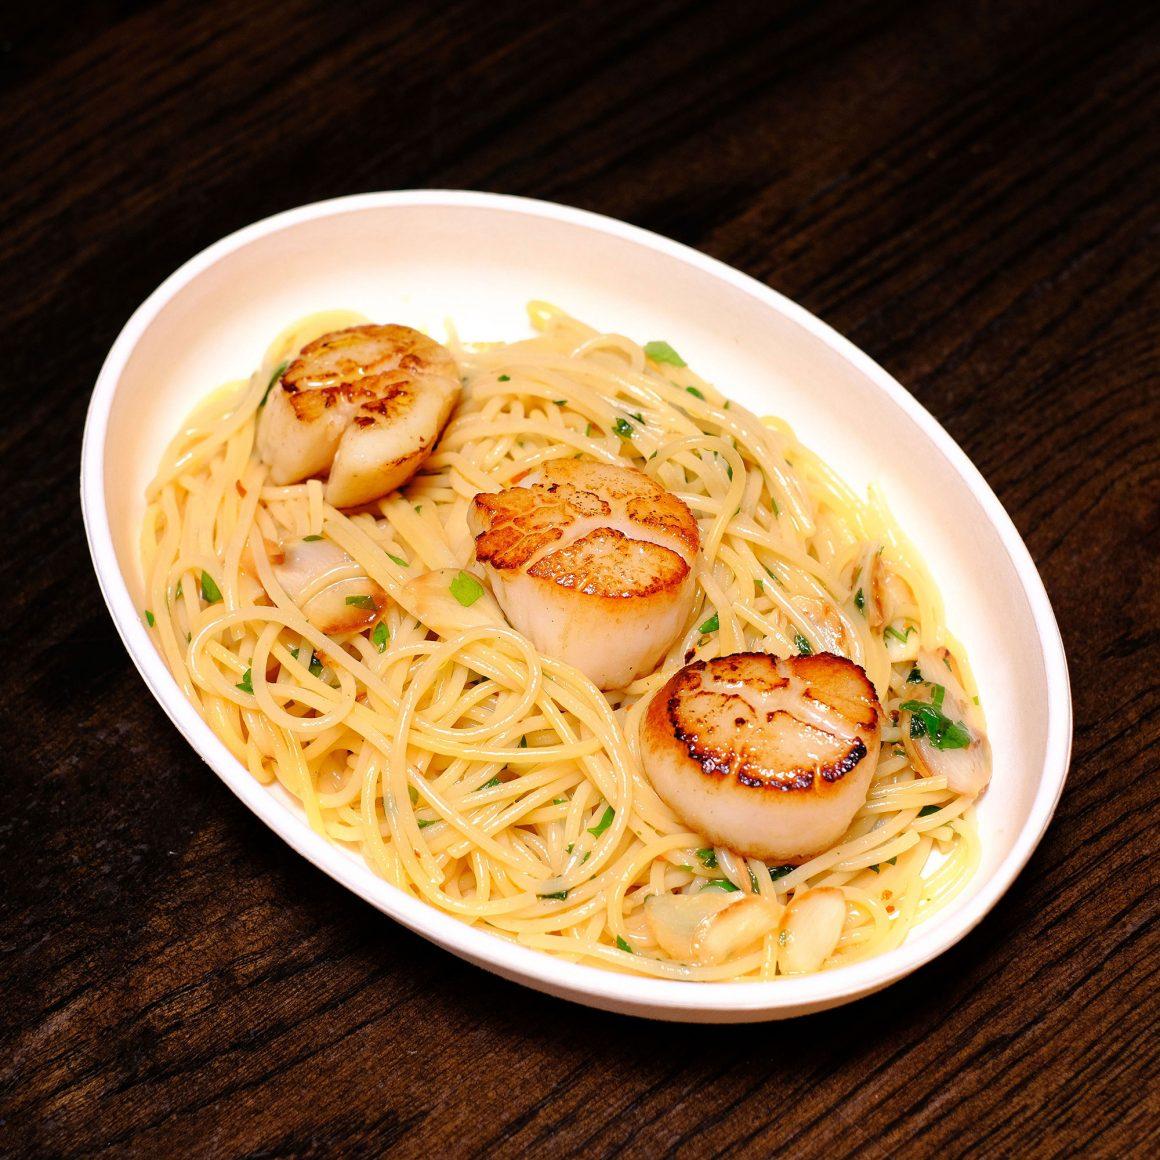 Spaghetti / PHOTO: BISTECCA TUSCAN STEAKHOUSE